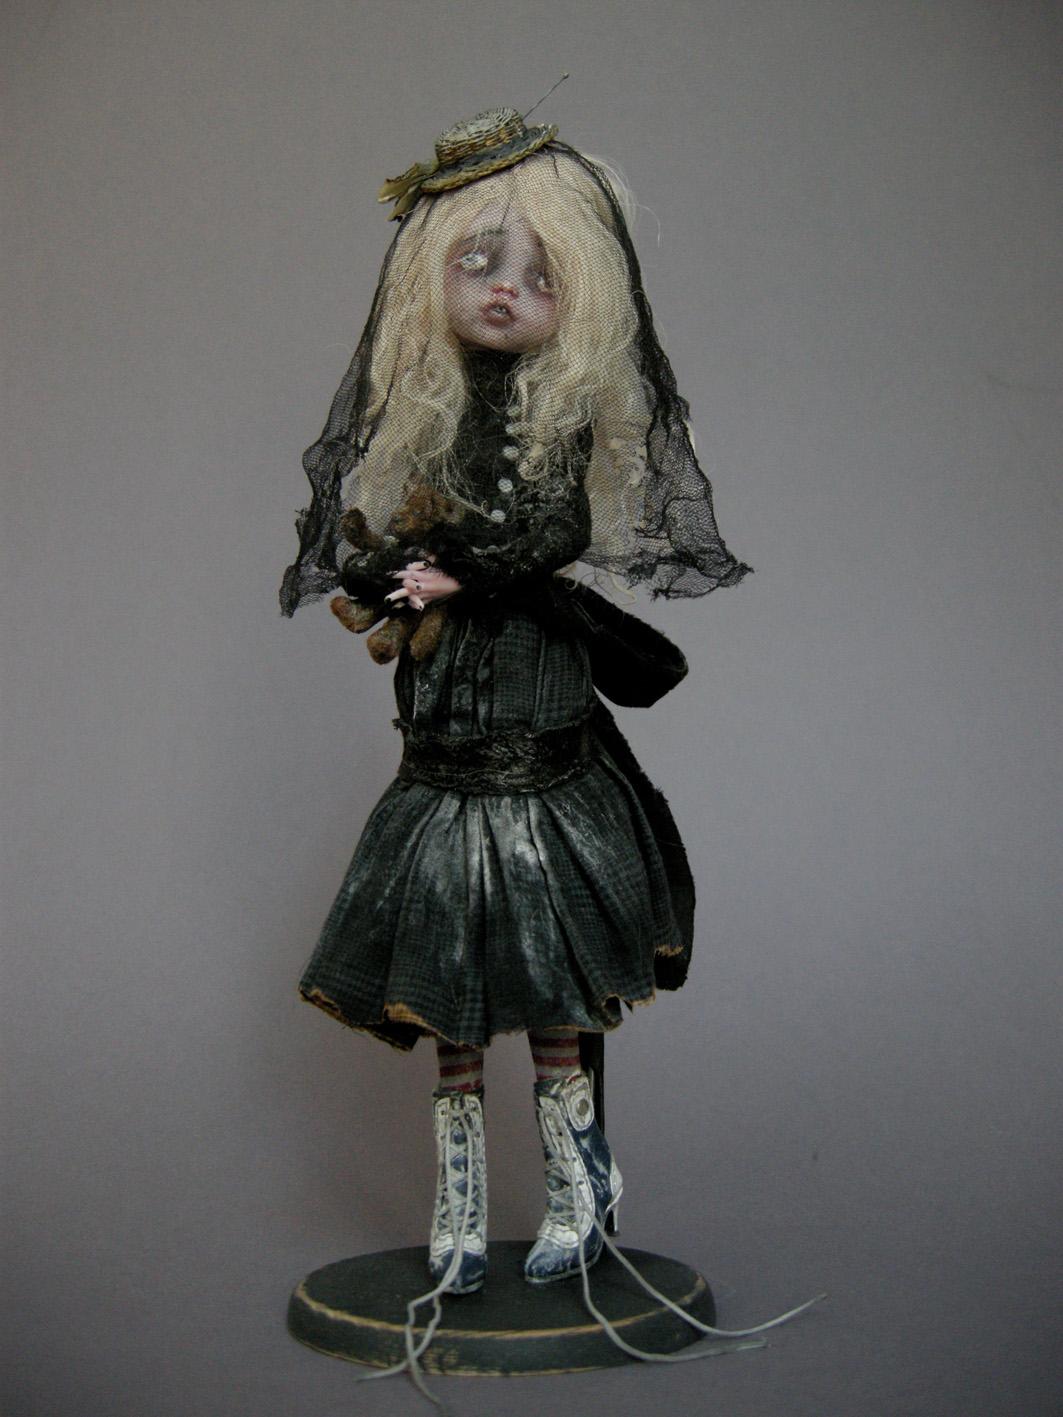 OOАK кукол Monster High - Страница 4 - Форум о куклах DP